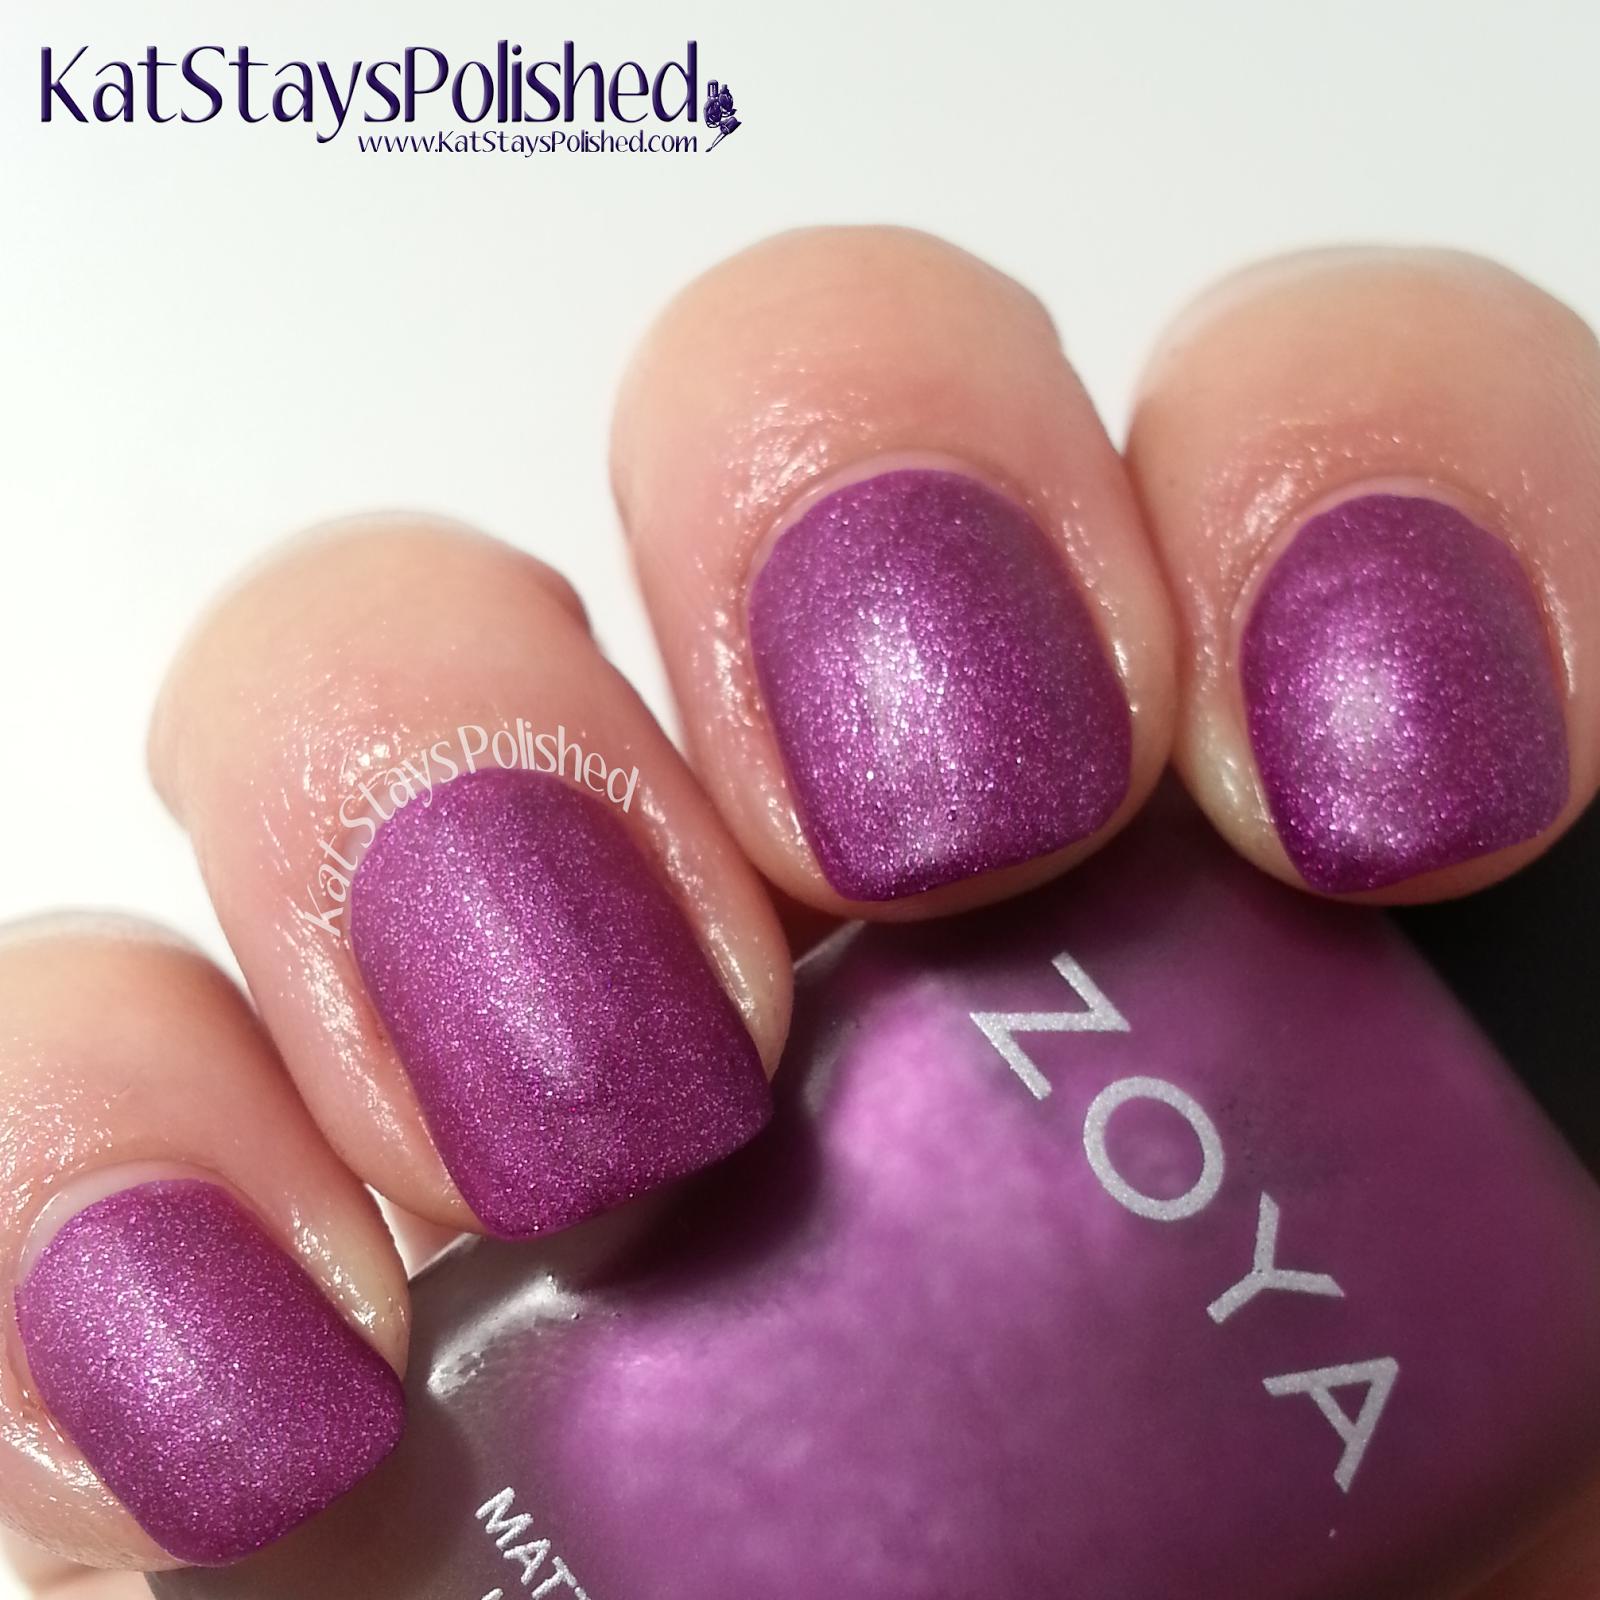 Zoya Matte Velvet - Harlow | Kat Stays Polished